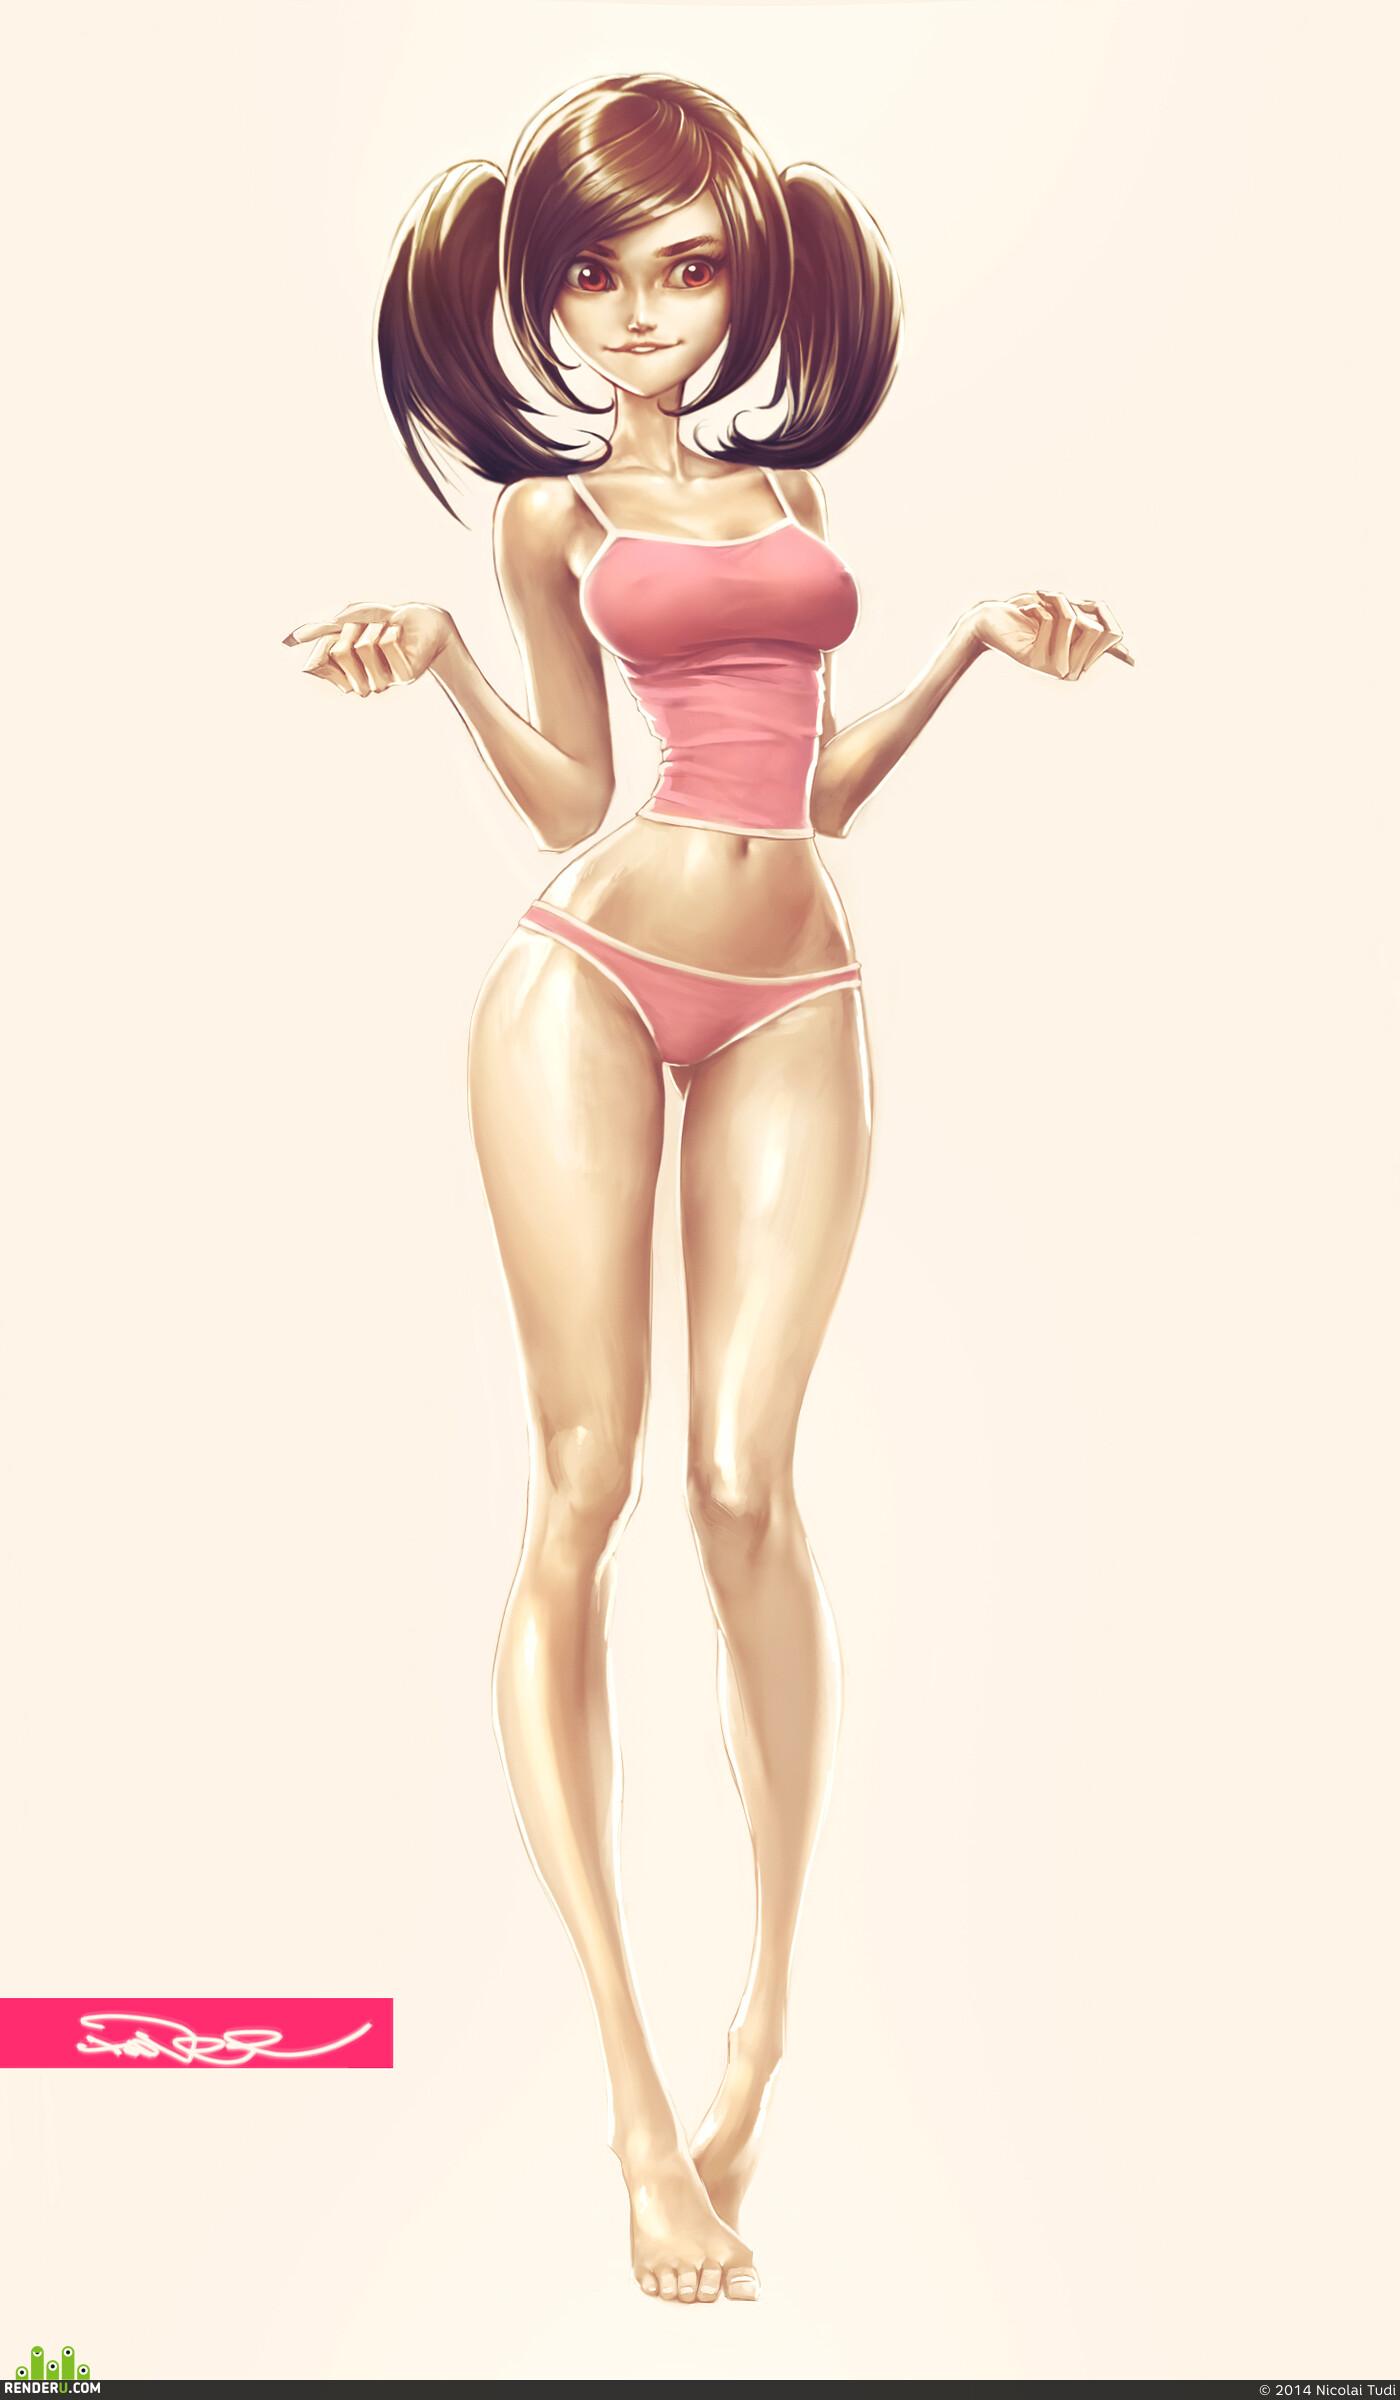 Naked girl cartoon characters